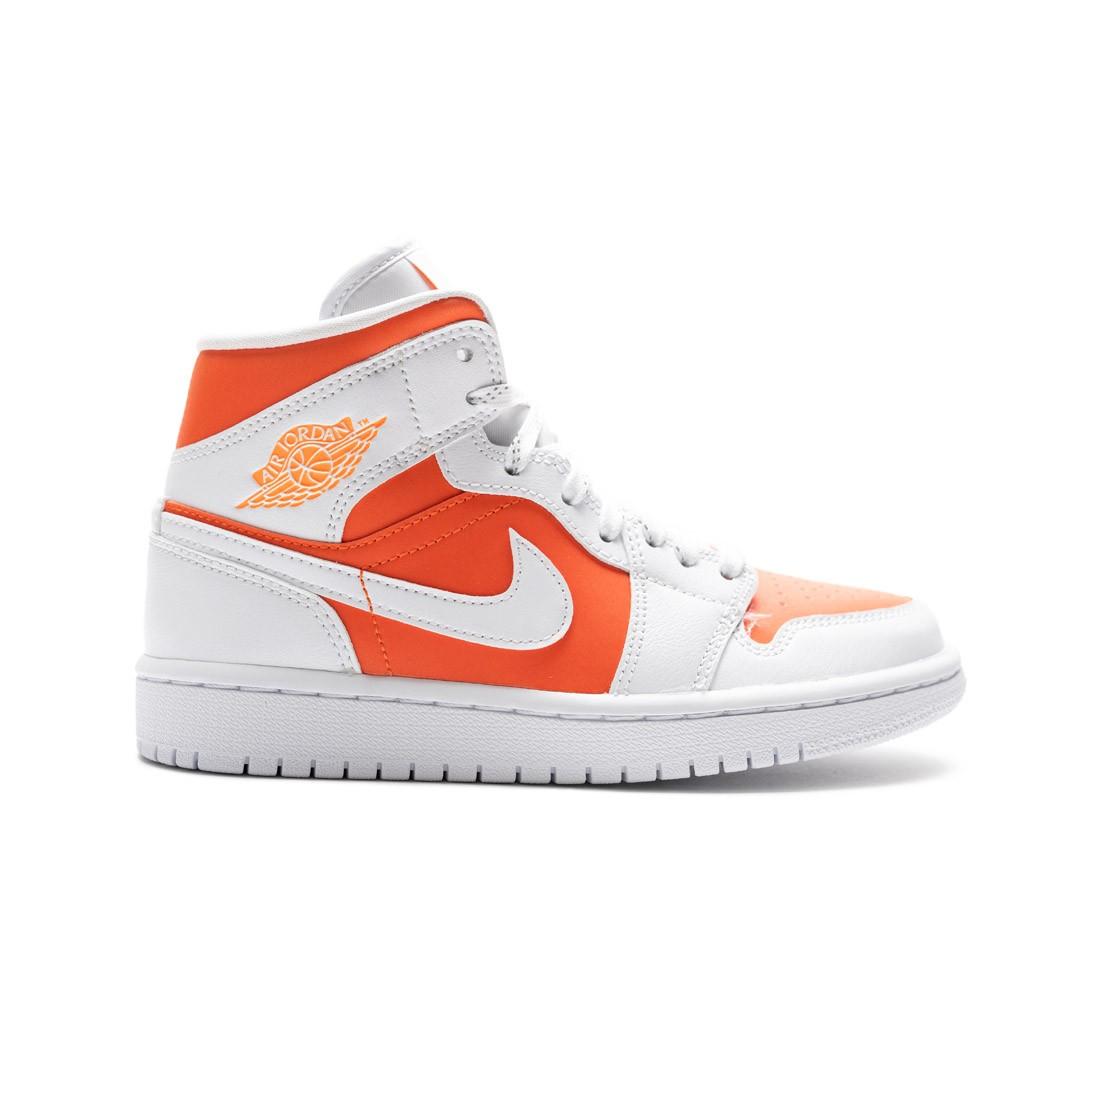 Air Jordan 1 Mid SE Women  (bright citrus / white)